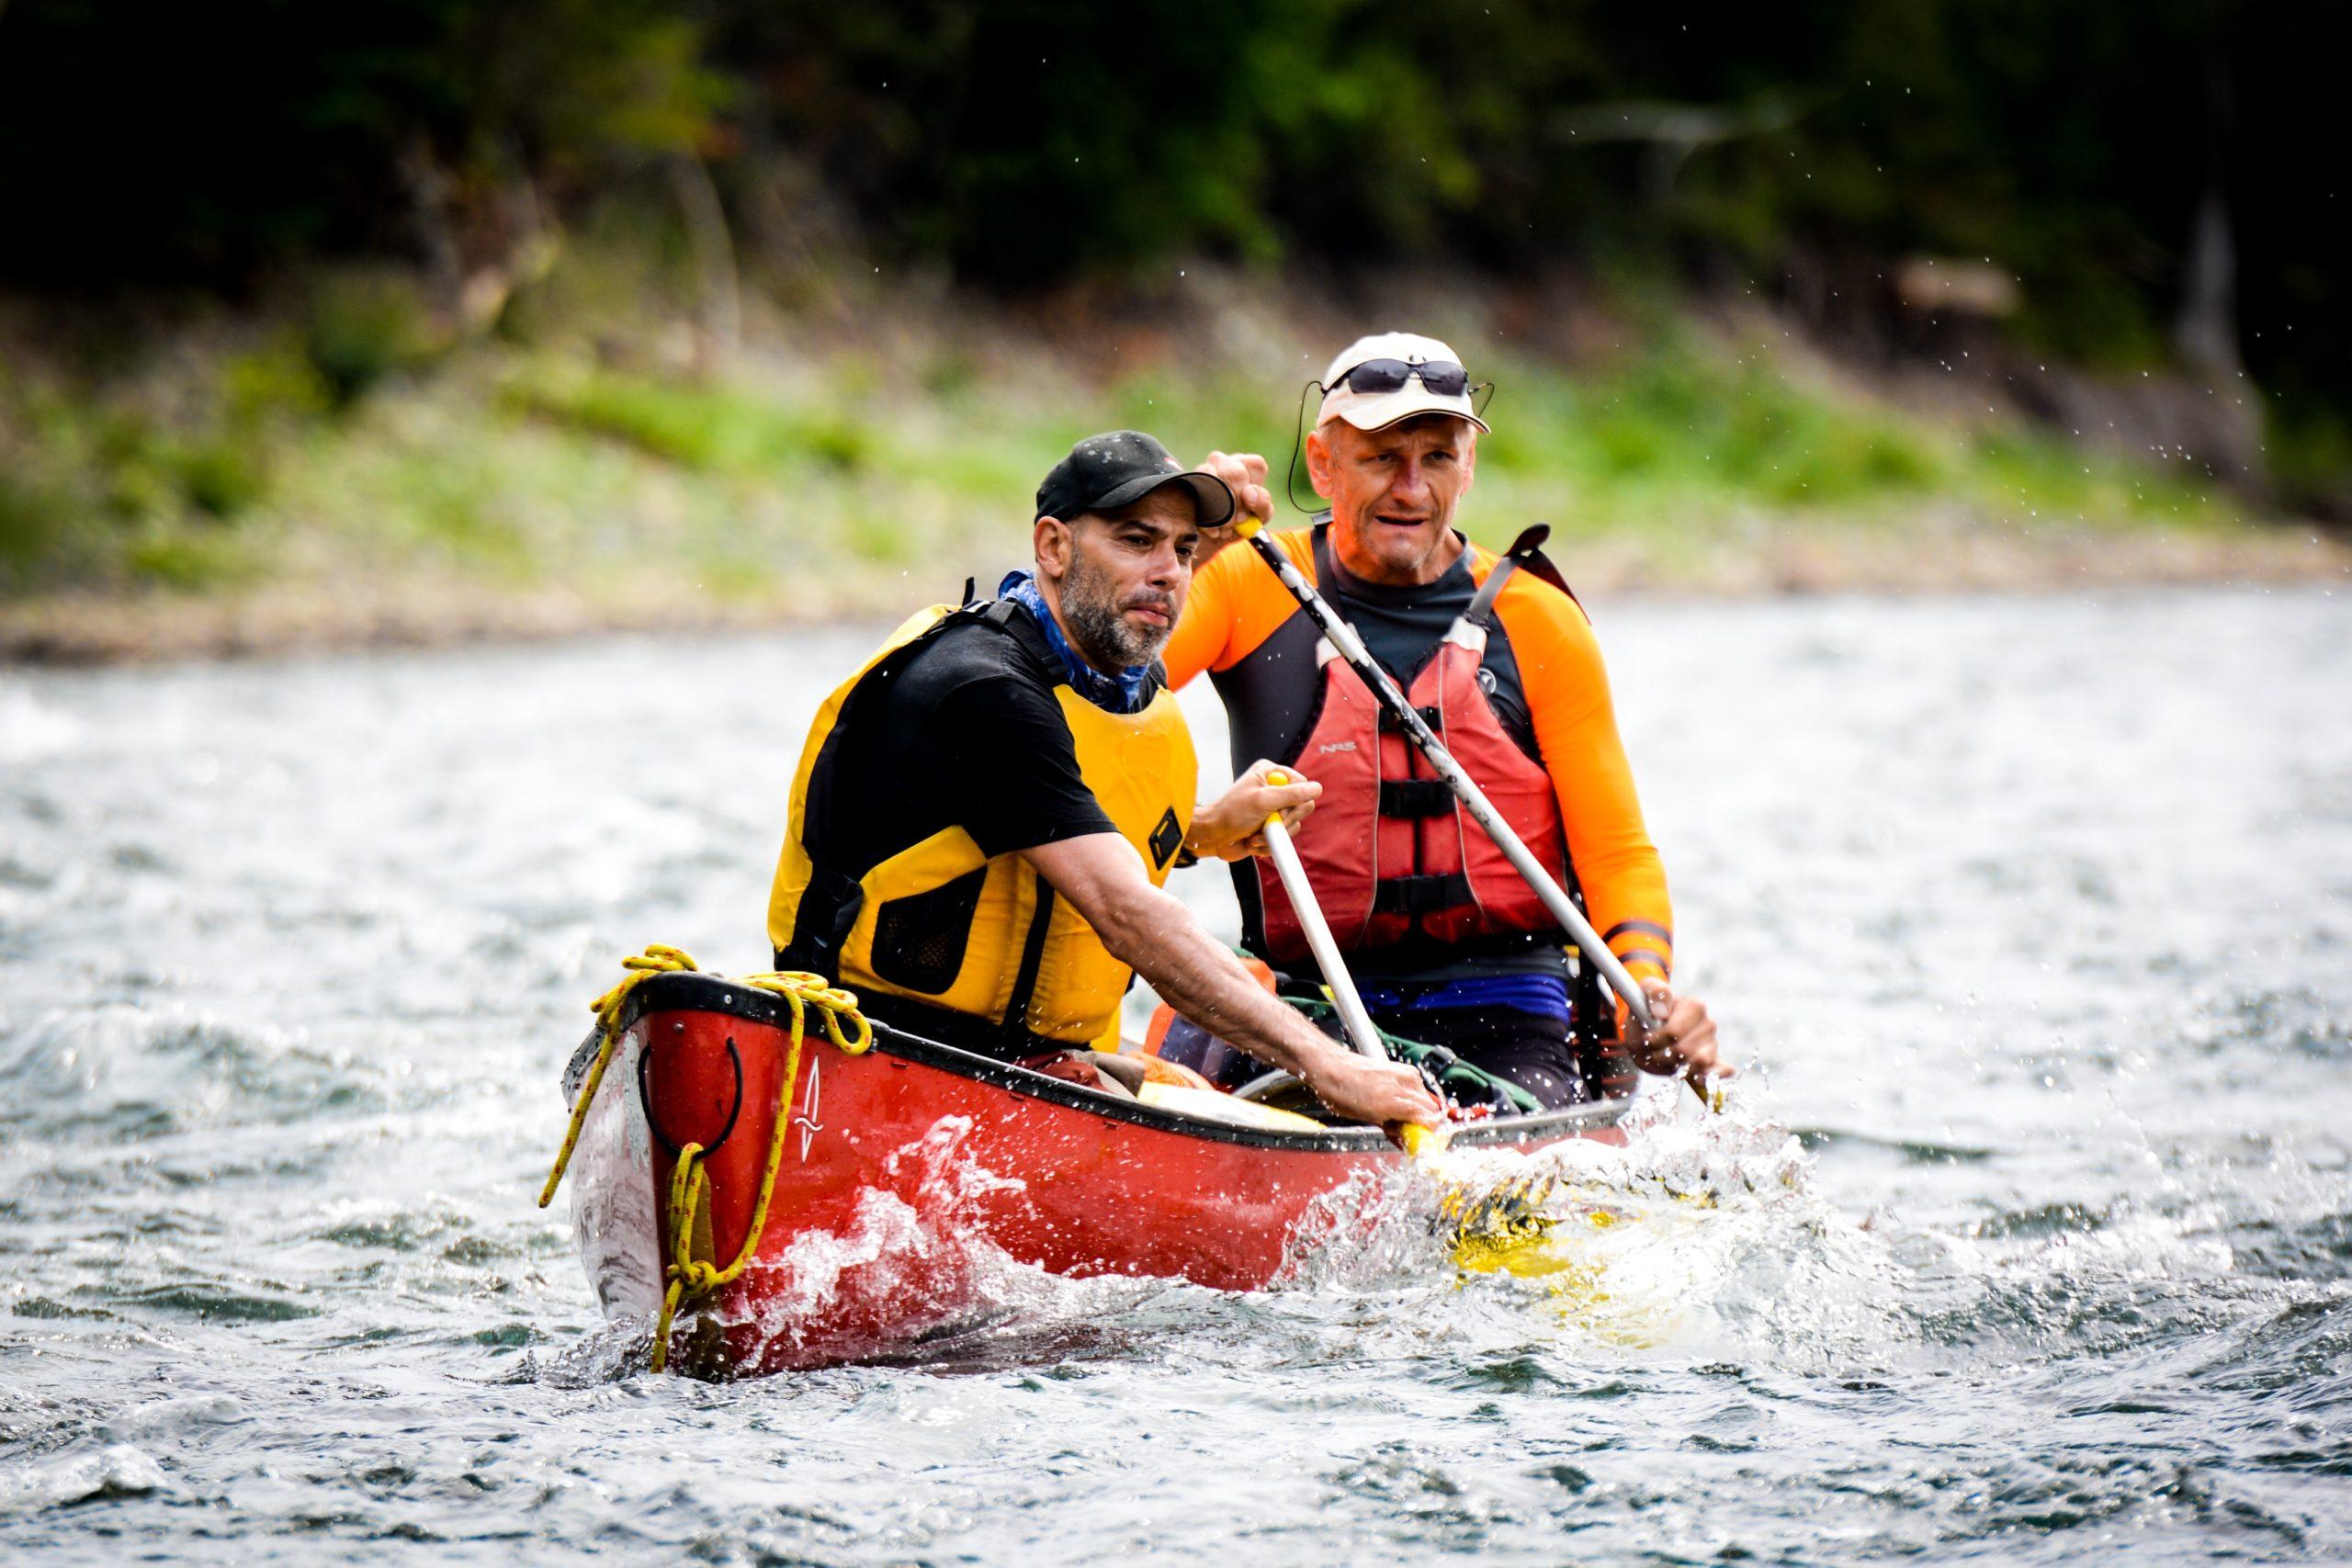 People canoe down river rapids.